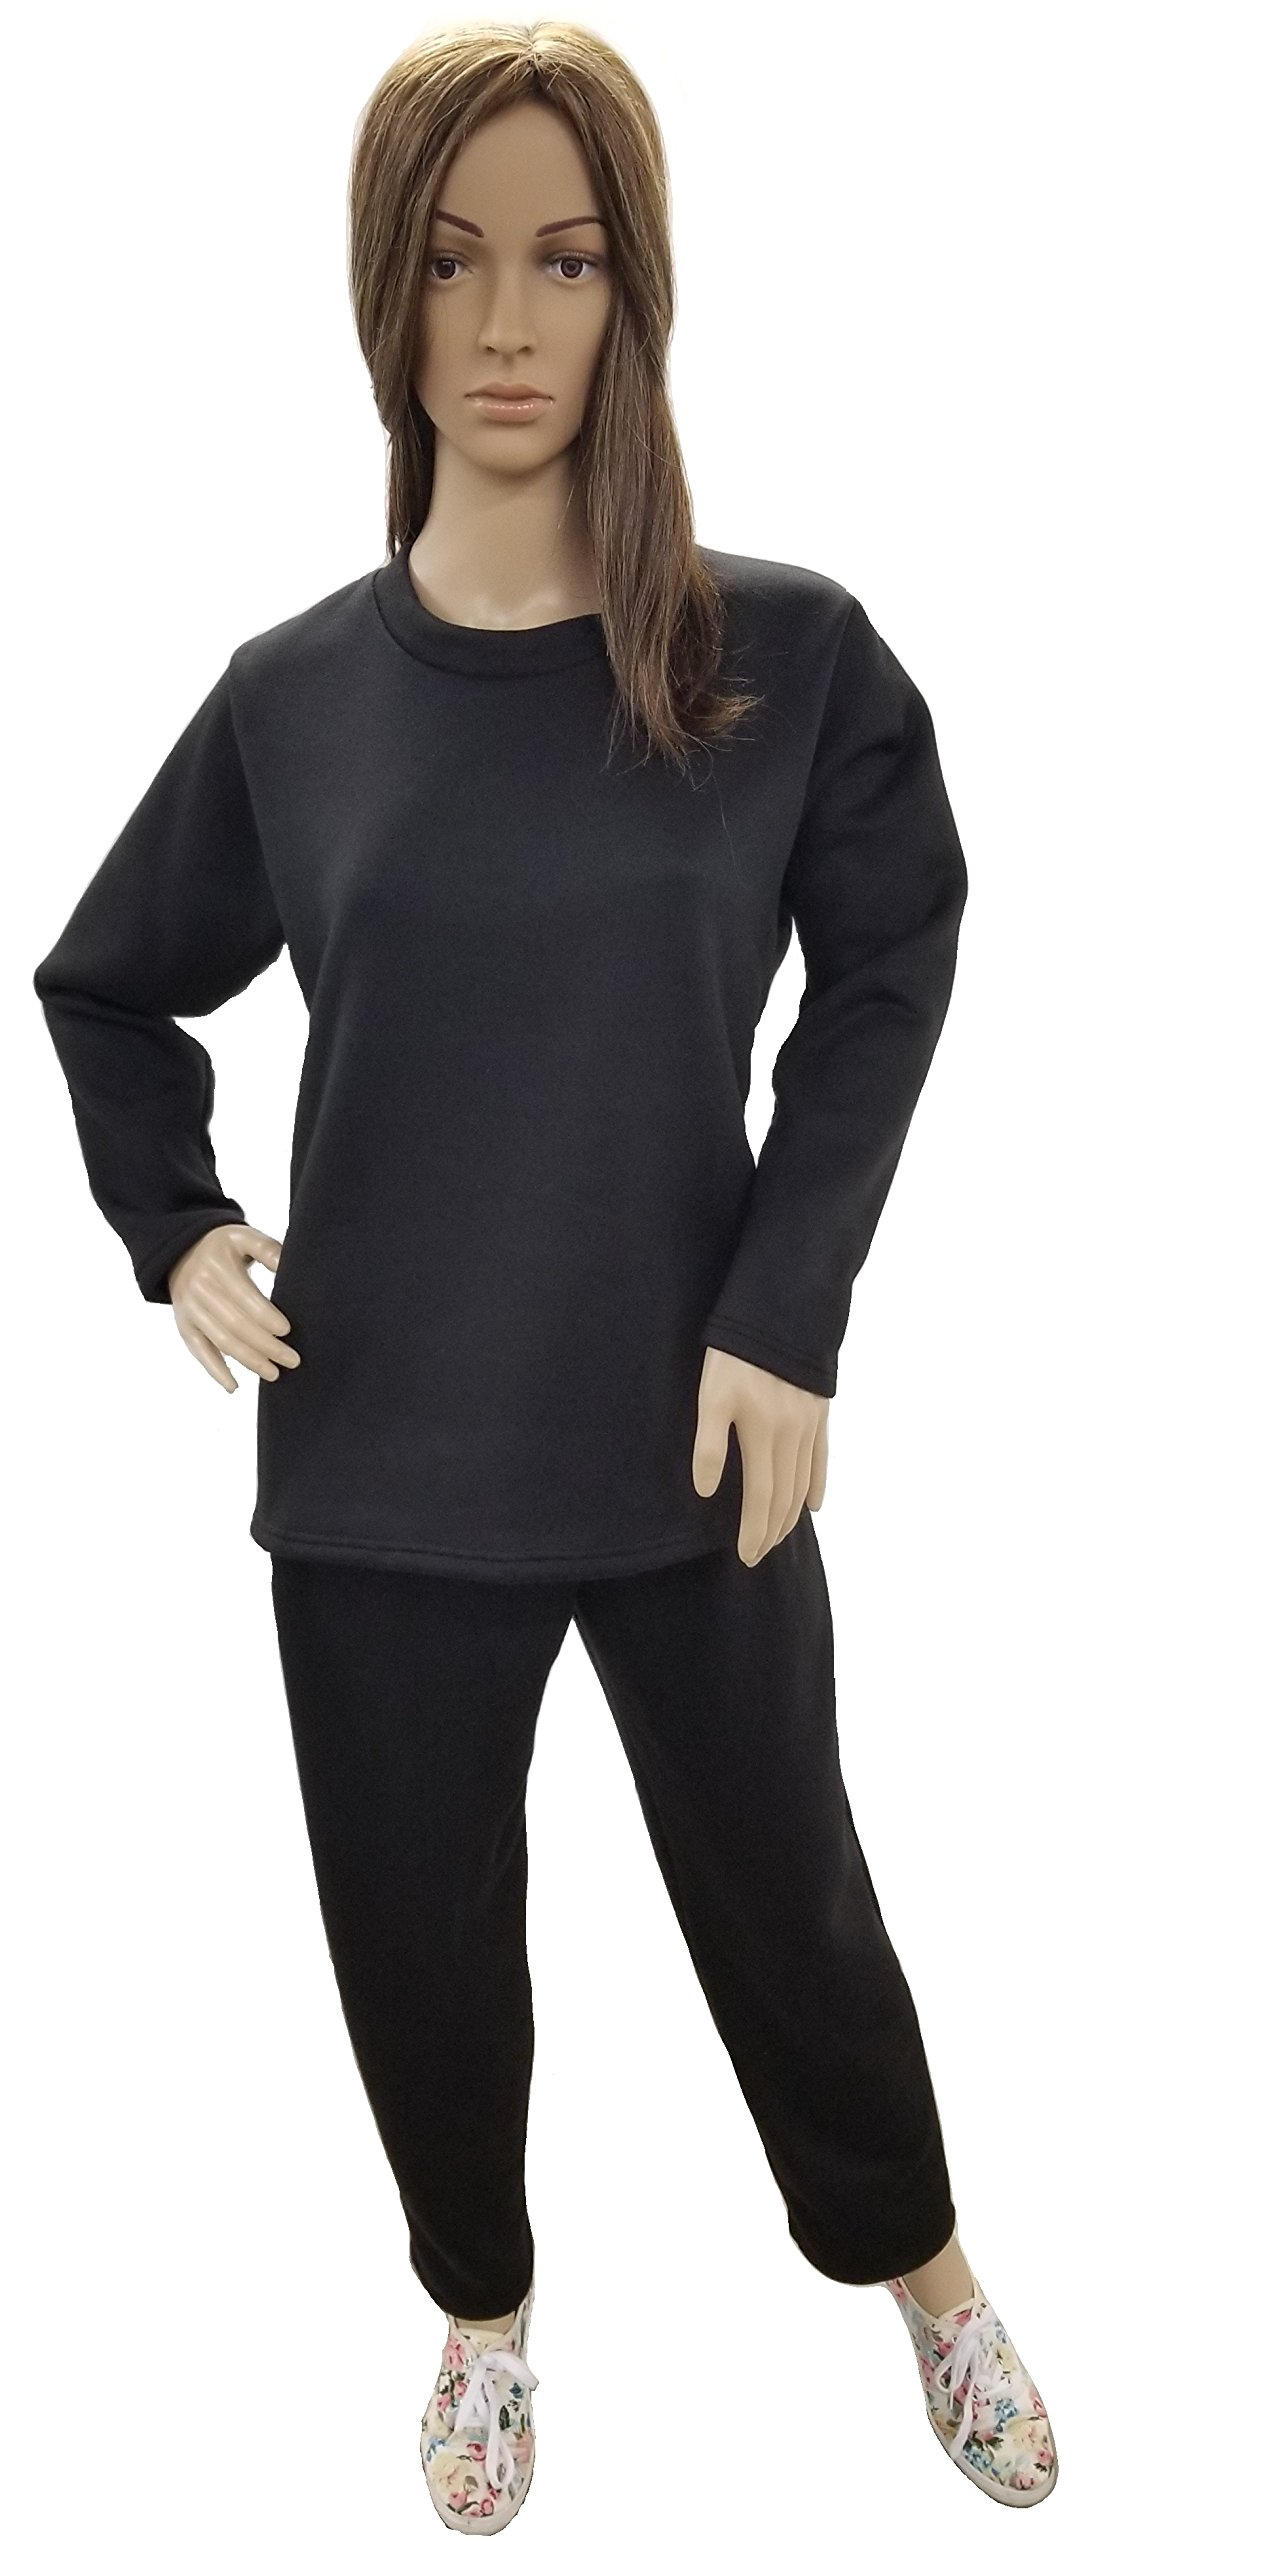 J & E Talit Inc. Women's Fleece Sweatsuit Set-Long Sleeve Comfort Fit Side Pocket Design Cotton Blend (2X, Black)